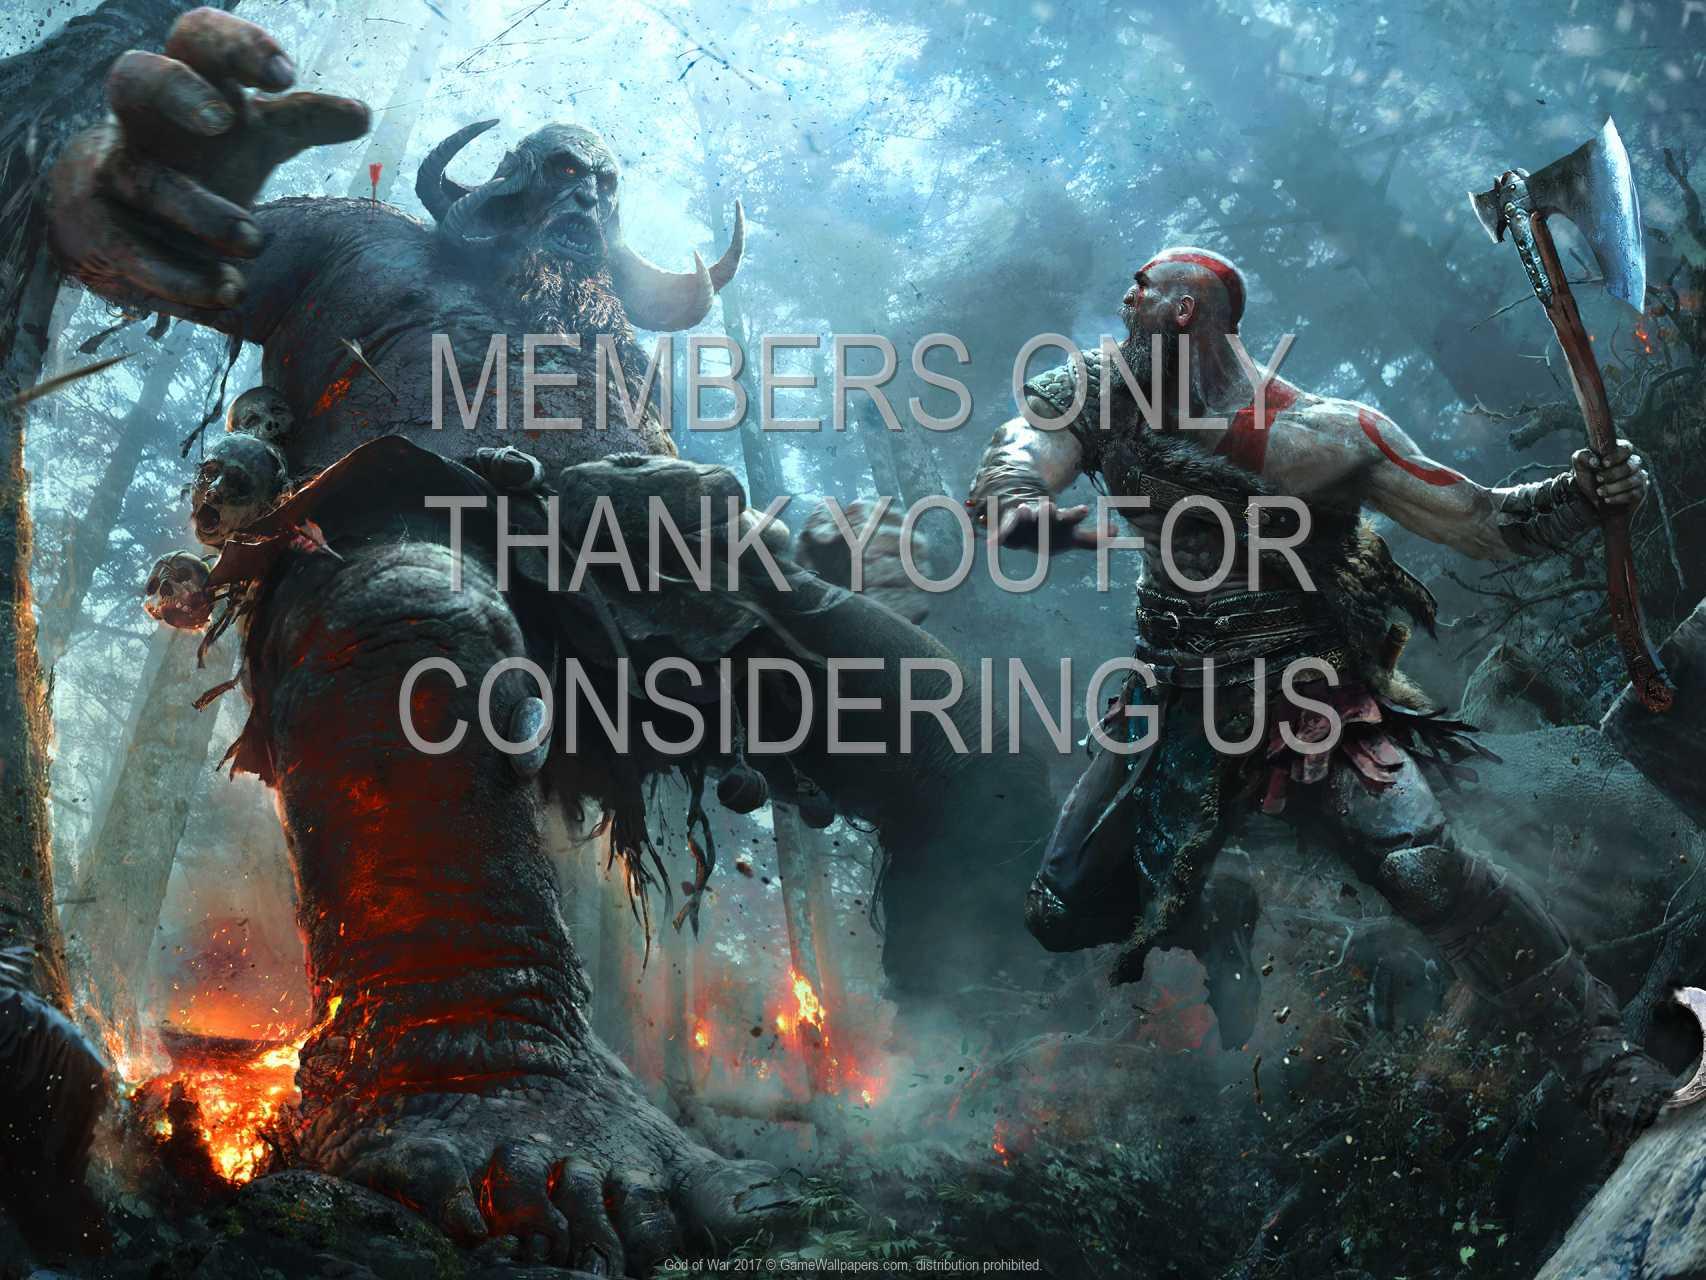 God of War 2017 720p Horizontal Mobile wallpaper or background 01